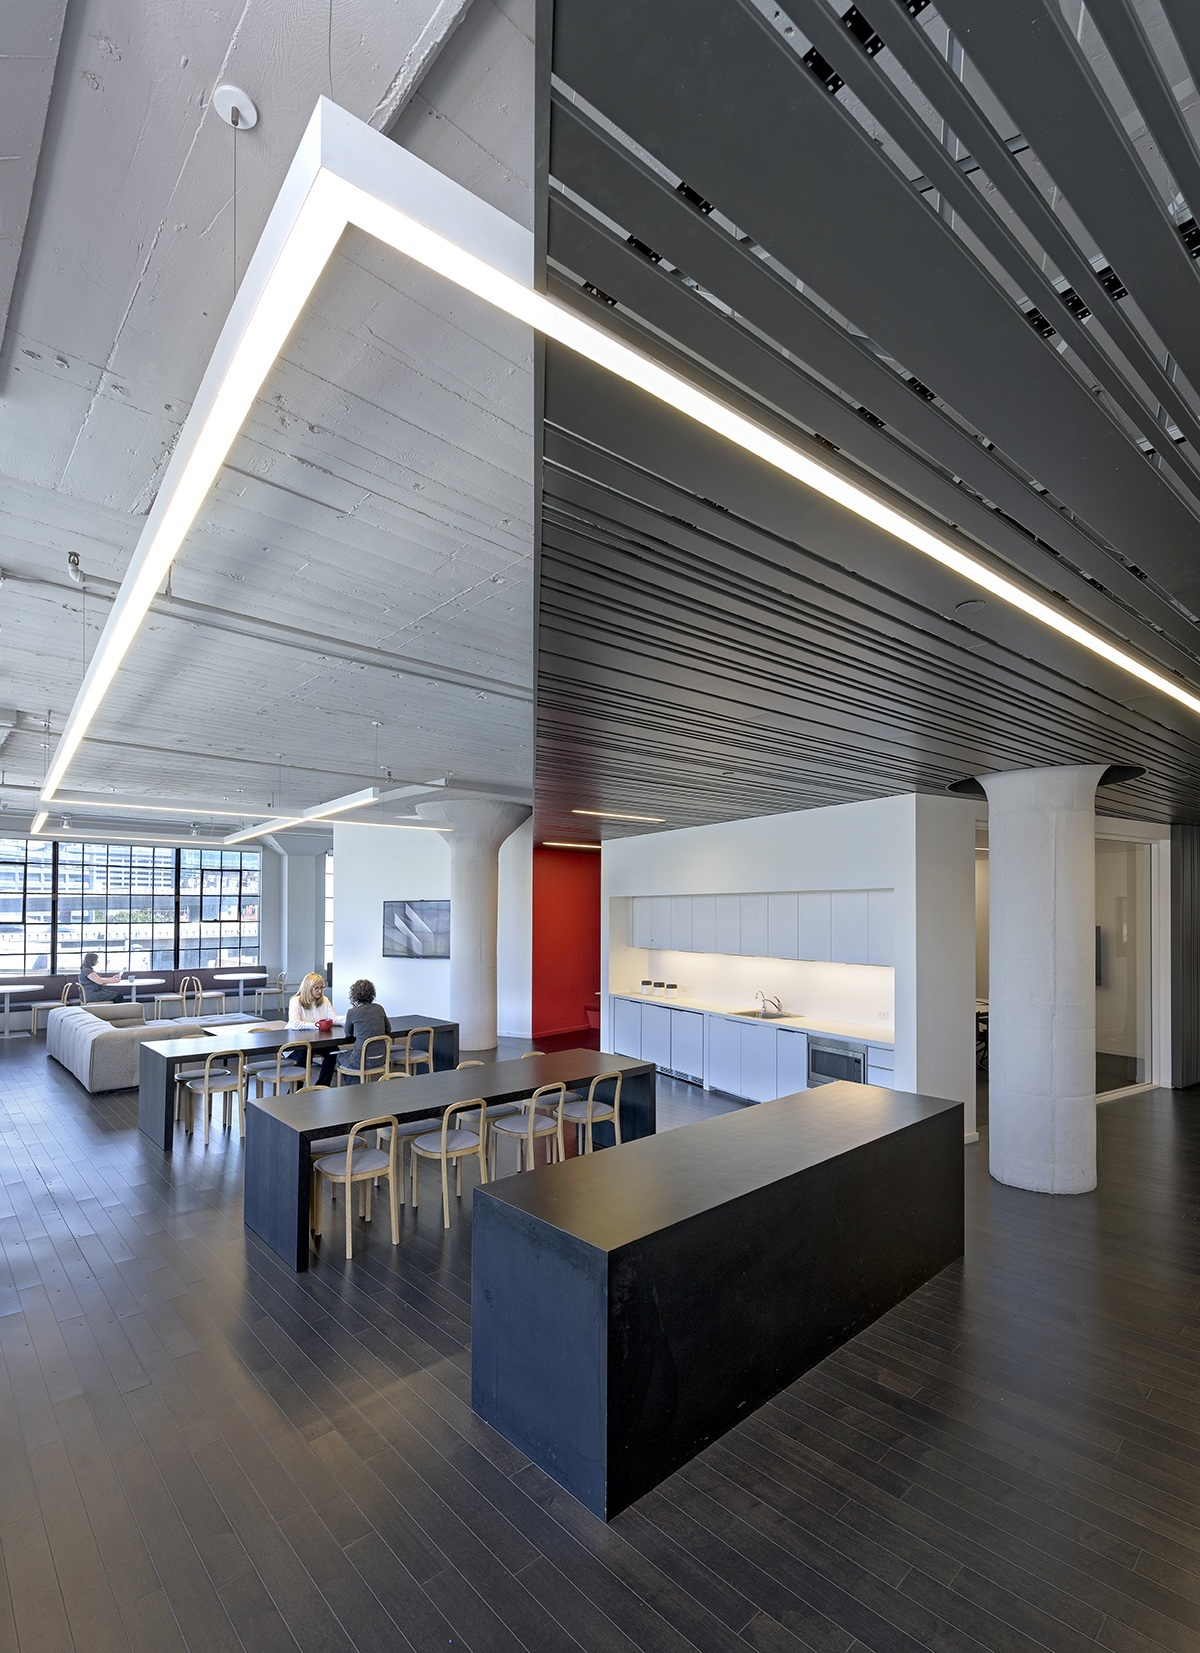 wired-office-gensler-10